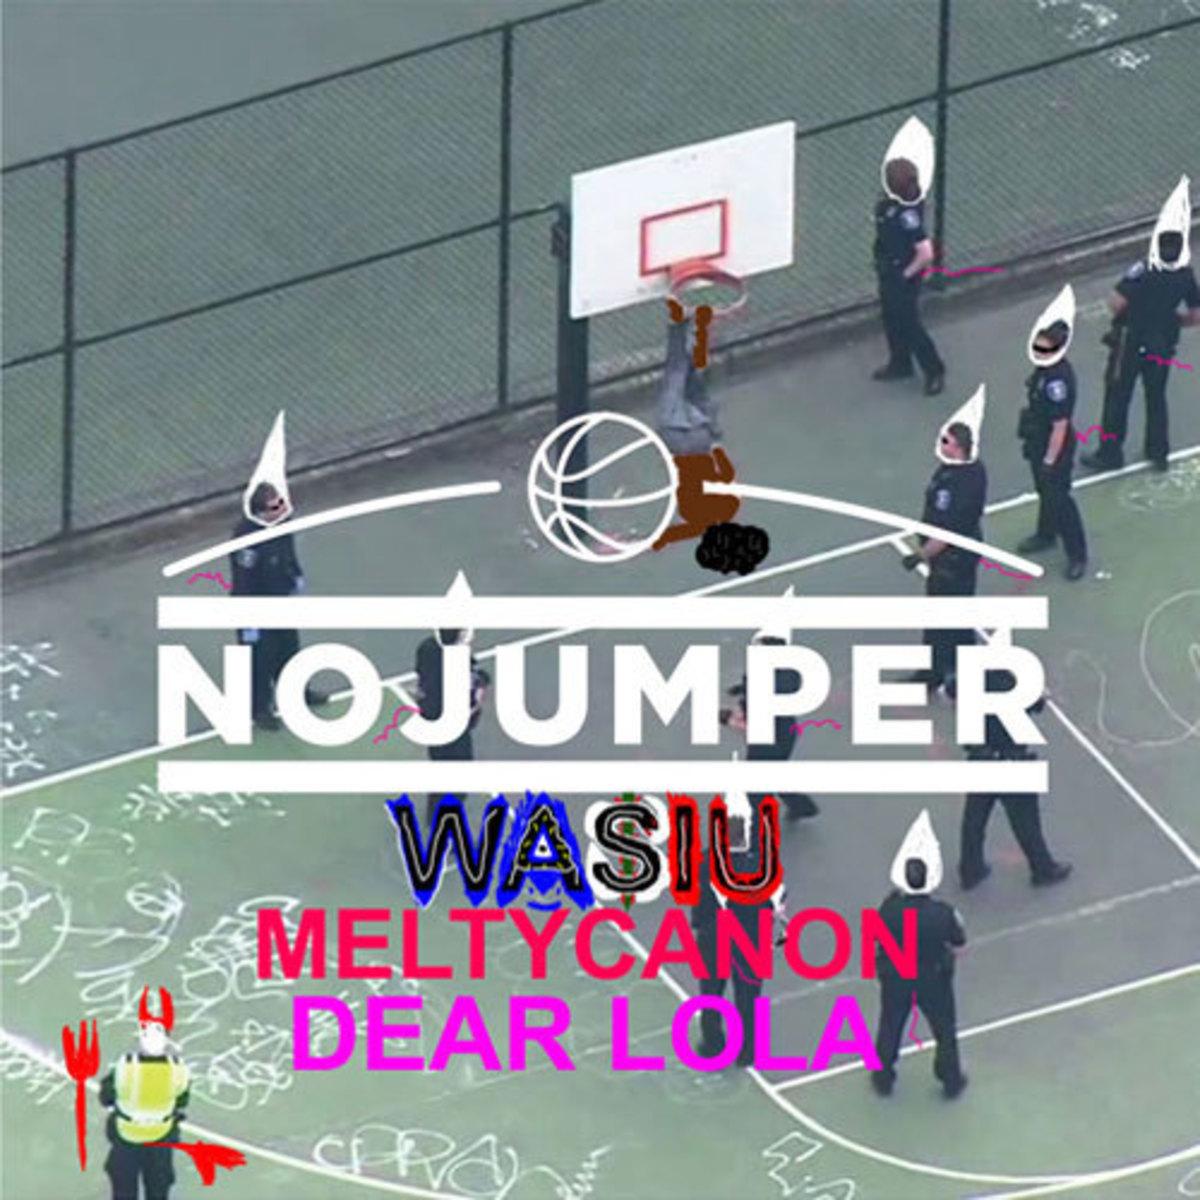 wasiu-no-jumper.jpg